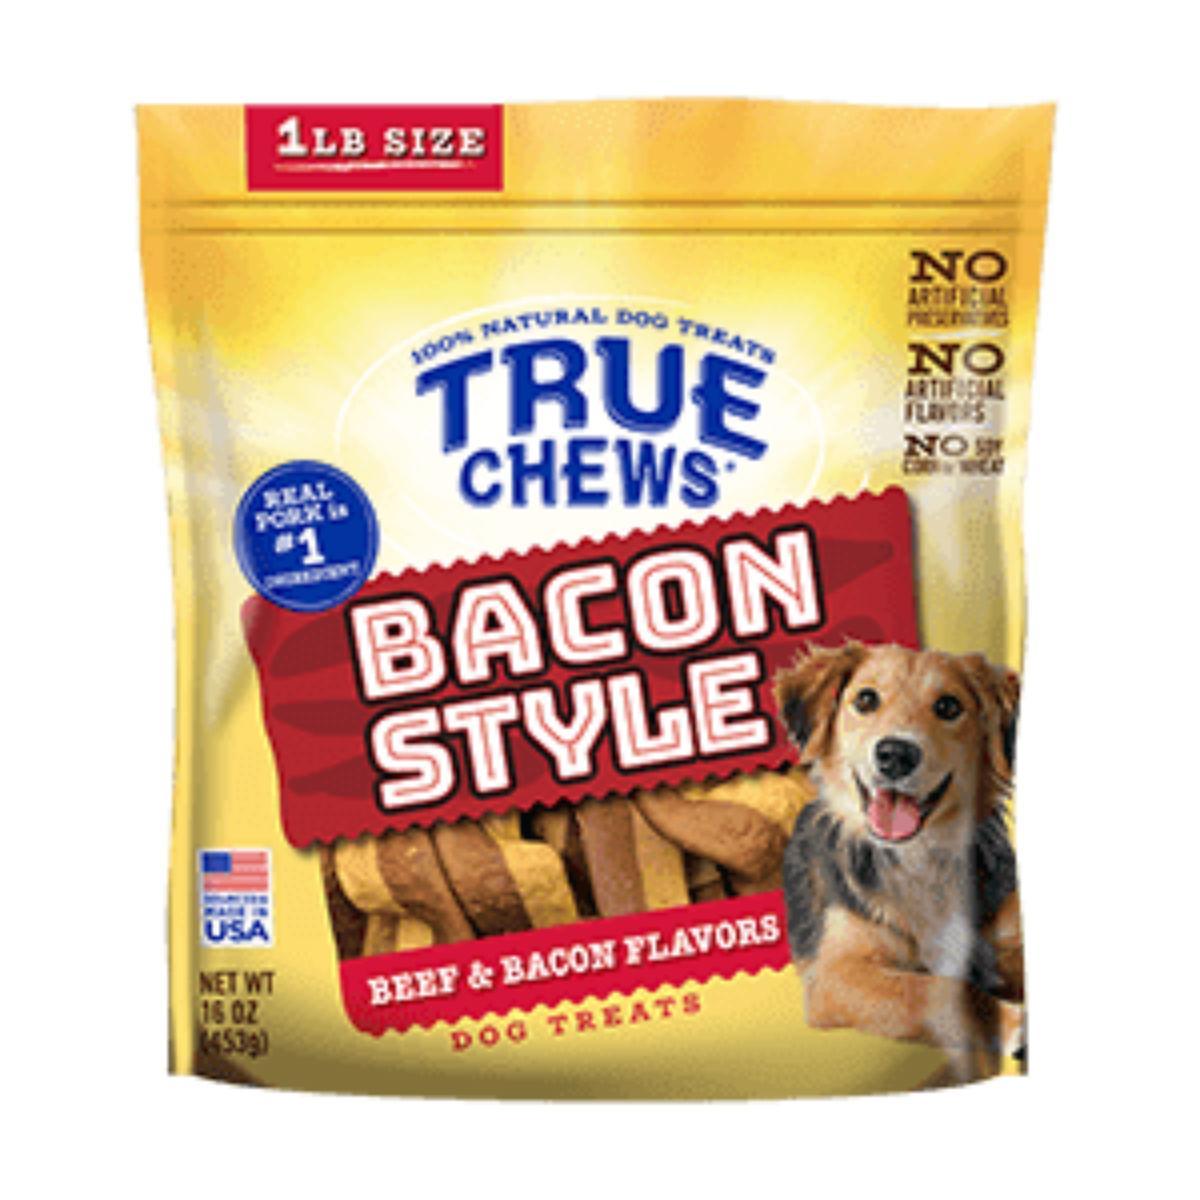 True Chews Bacon Style Dog Treat - Beef & Bacon